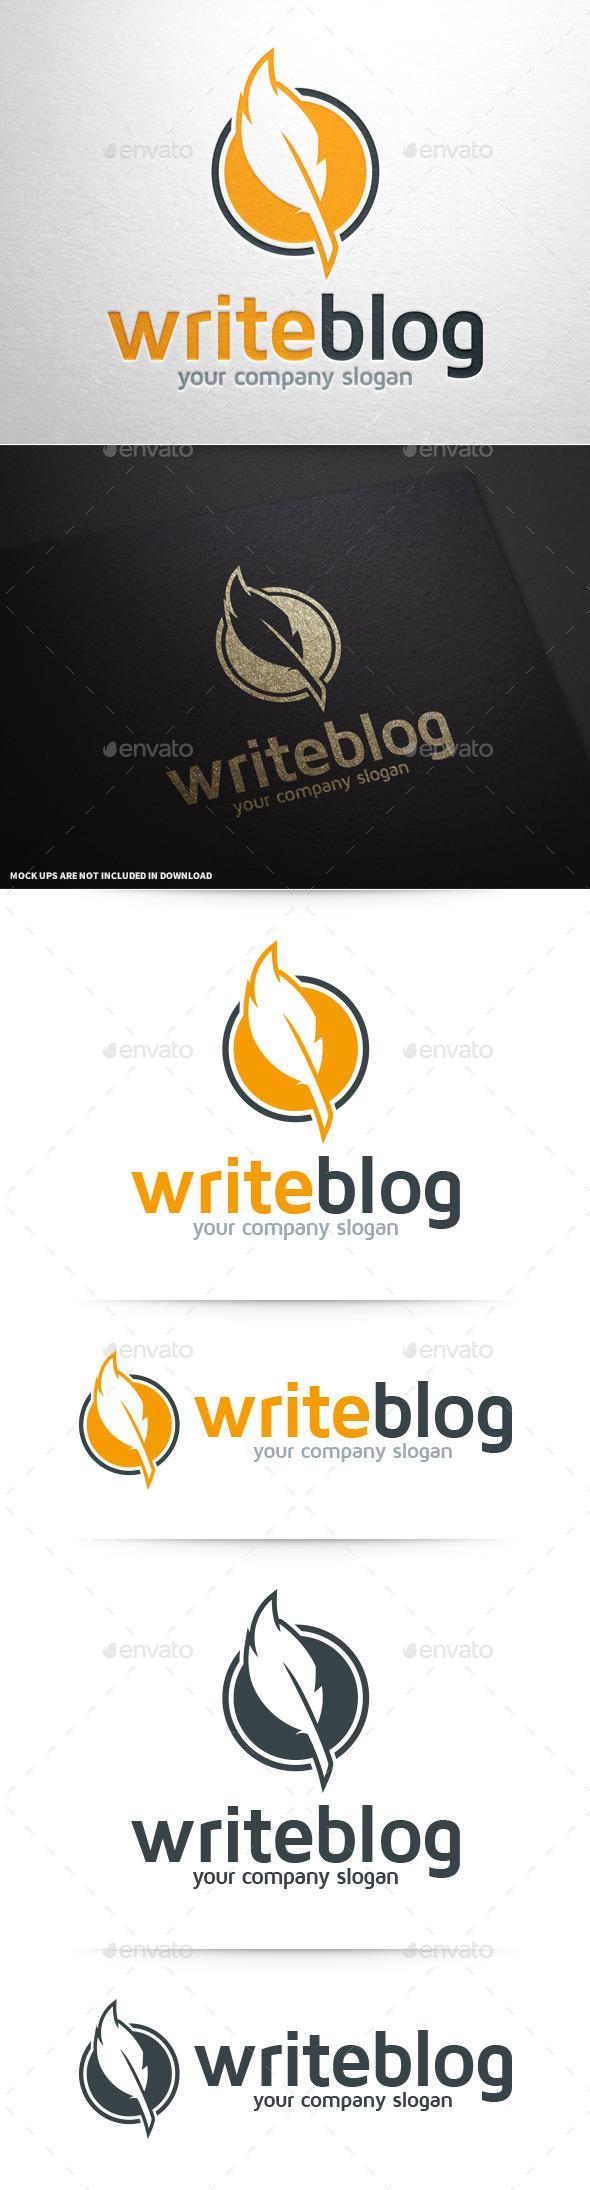 GraphicRiver Write Blog Feather Pen Logo 10082884